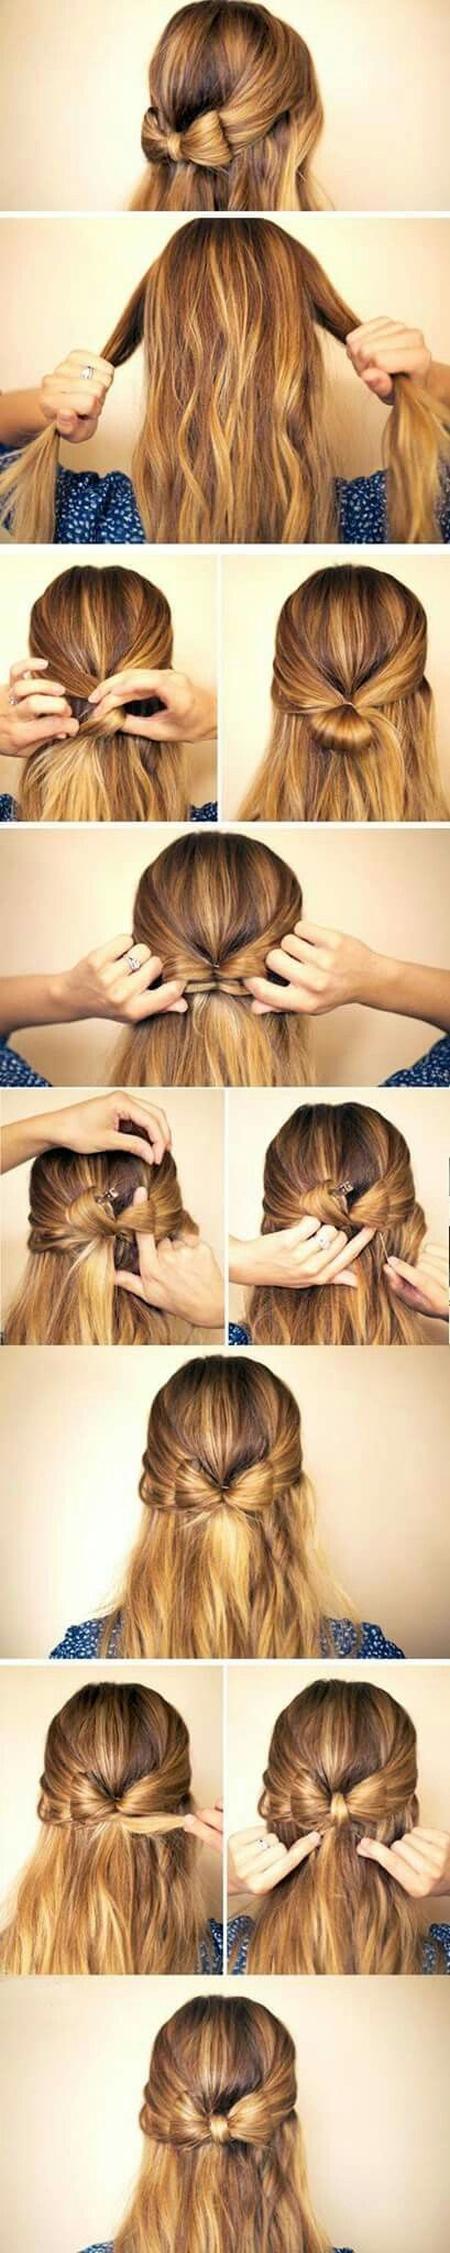 Бантик из волос: фото